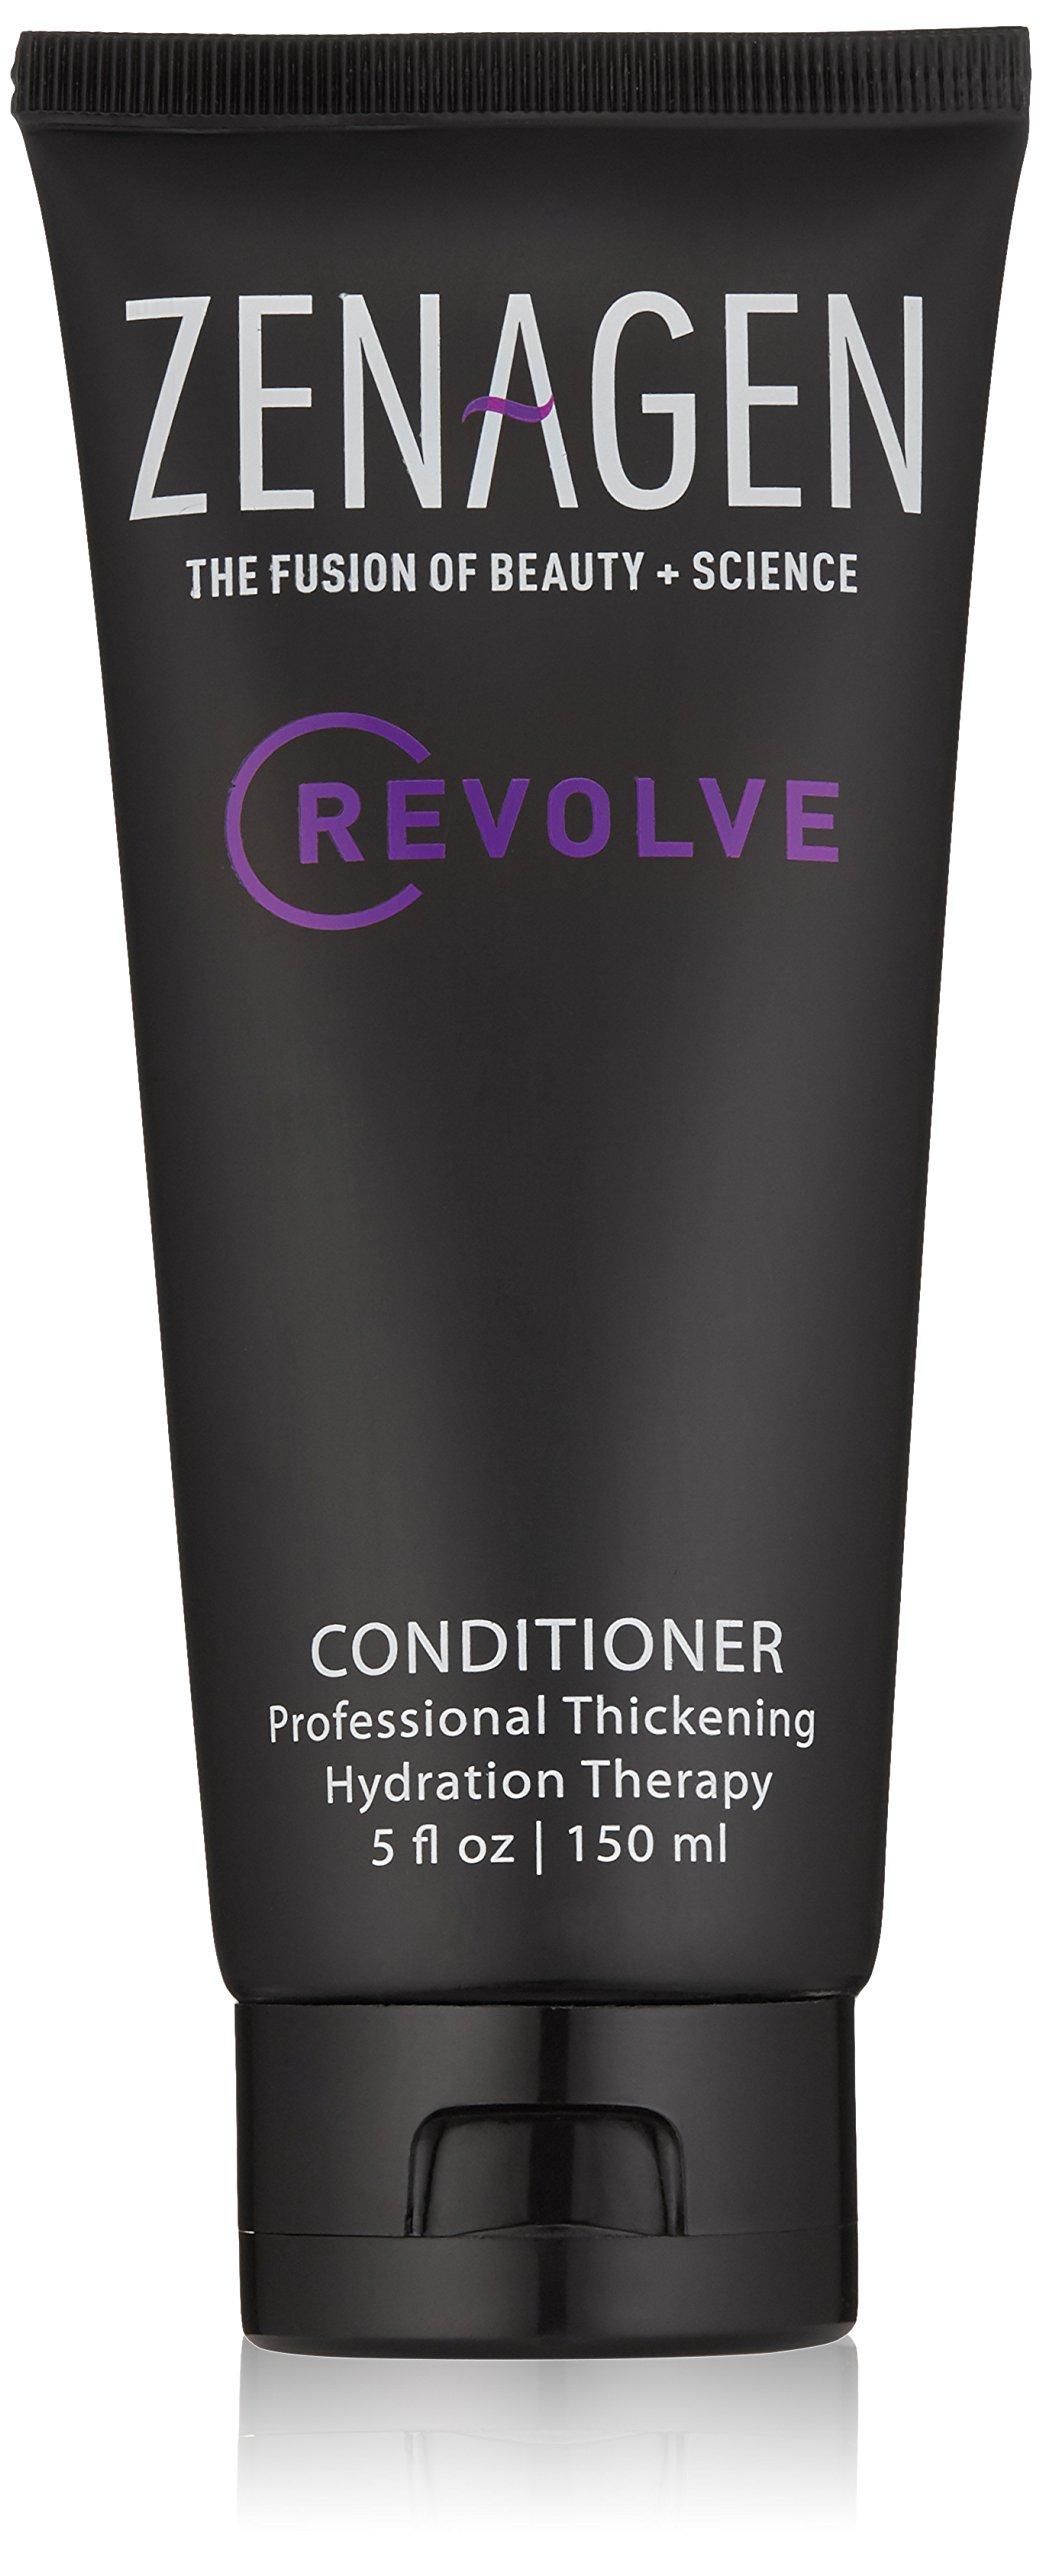 Zenagen Revolve Thickening Conditioner for Hair Loss and Fine Hair, 5 oz. by Zenagen